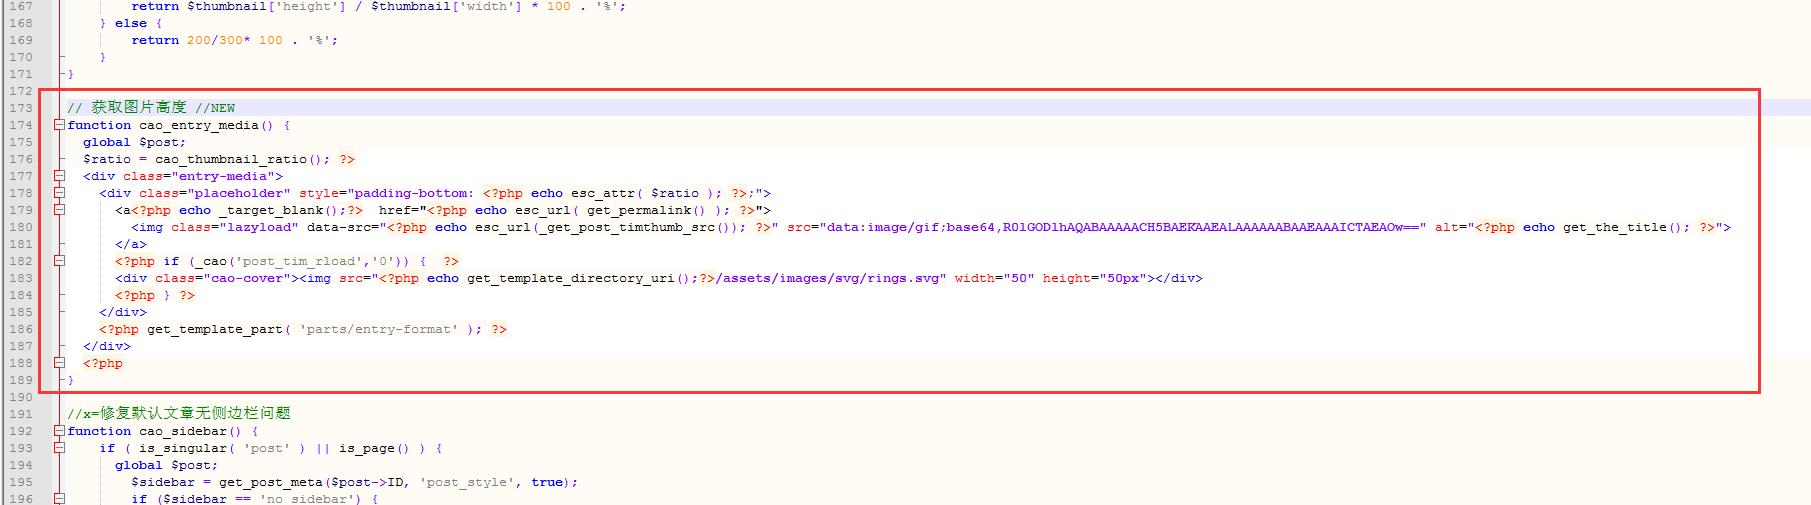 【WordPress教程】RiPro主题6.x开启鼠标划过文章网格加载动效后不能点击,如何解决?教程来了!